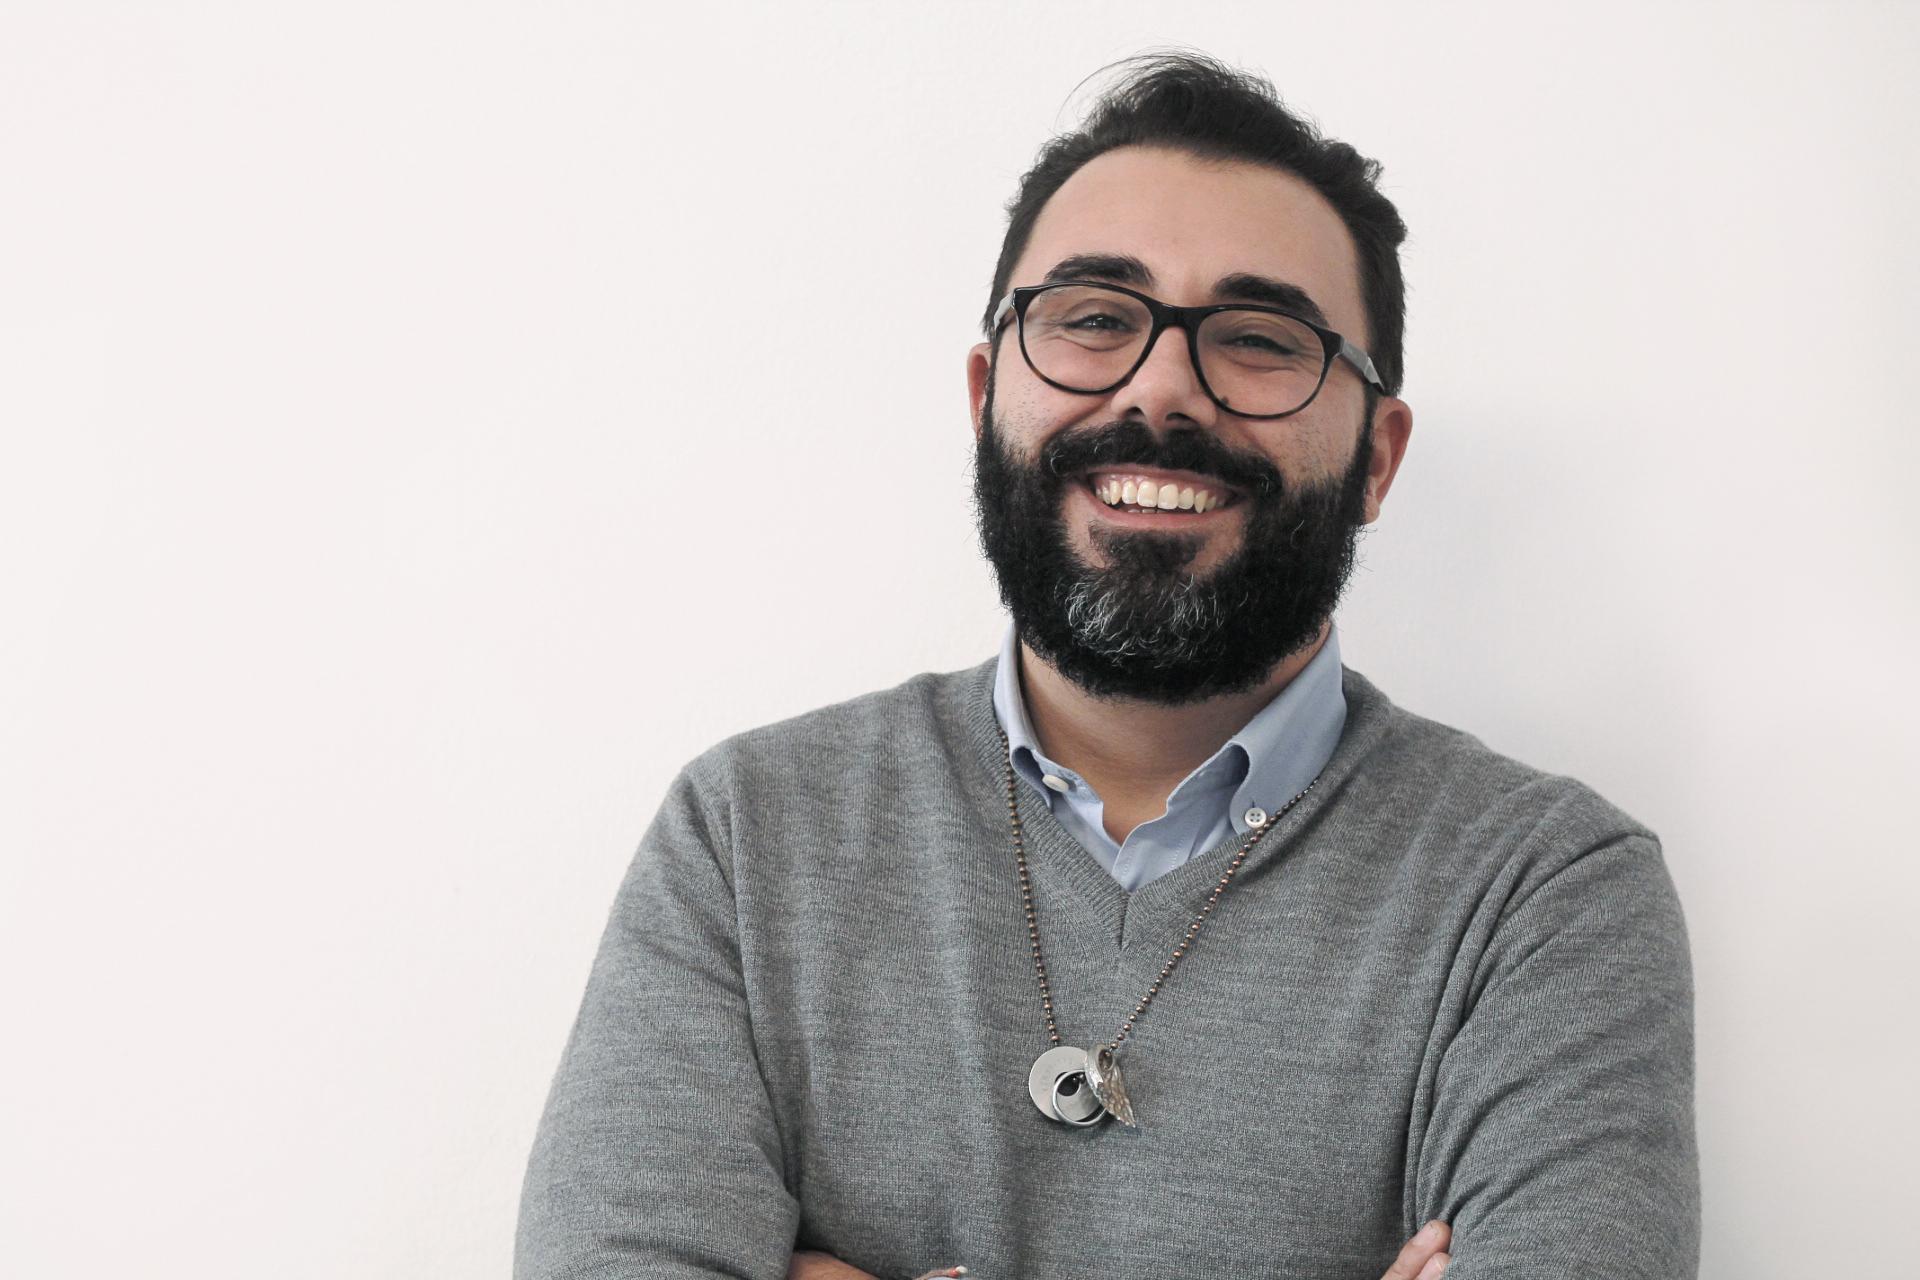 Paolo Miki Isidori